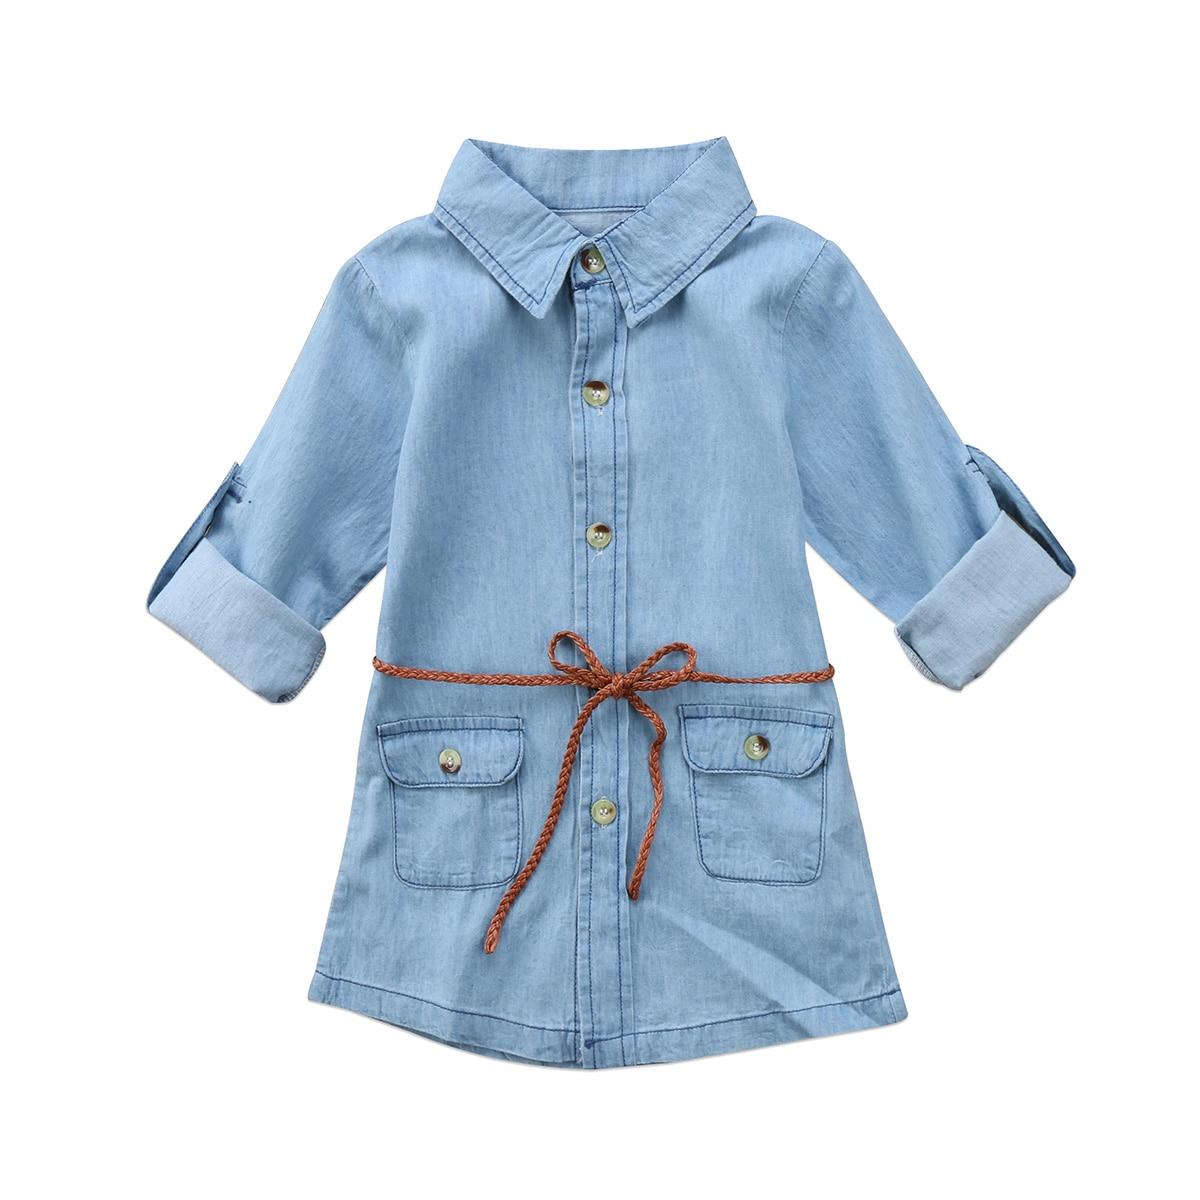 2017 Casual Cute Kids Girl Jeans bolsillo de tela vaquera manga larga Camiseta suelta camisa Mini vestido + cinturón 2 uds tamaño 3-7T